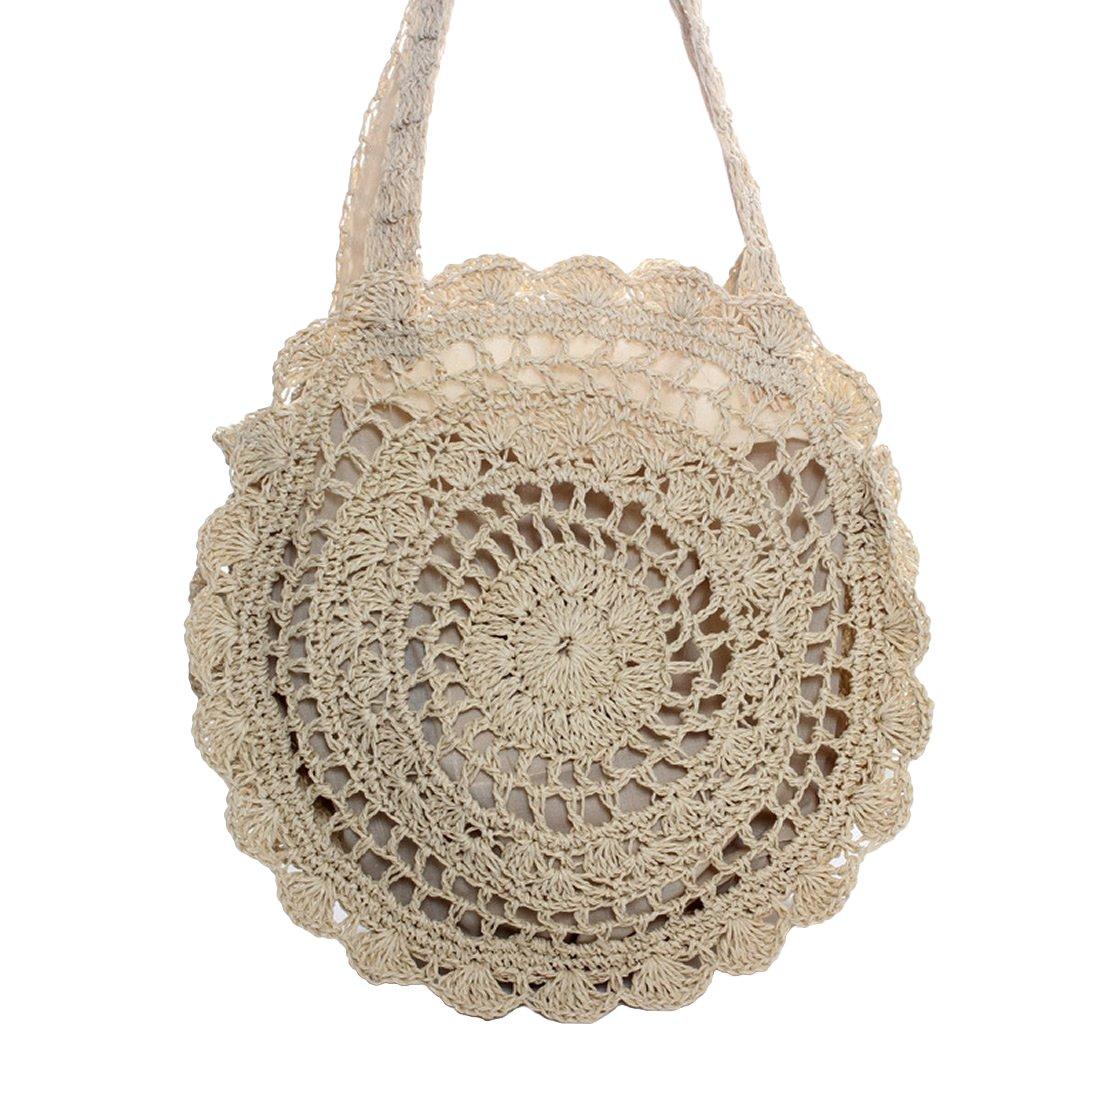 Women Straw Woven Bag Beach bag Crossbody Shoulder Bag for Summer Holiday (Beige)